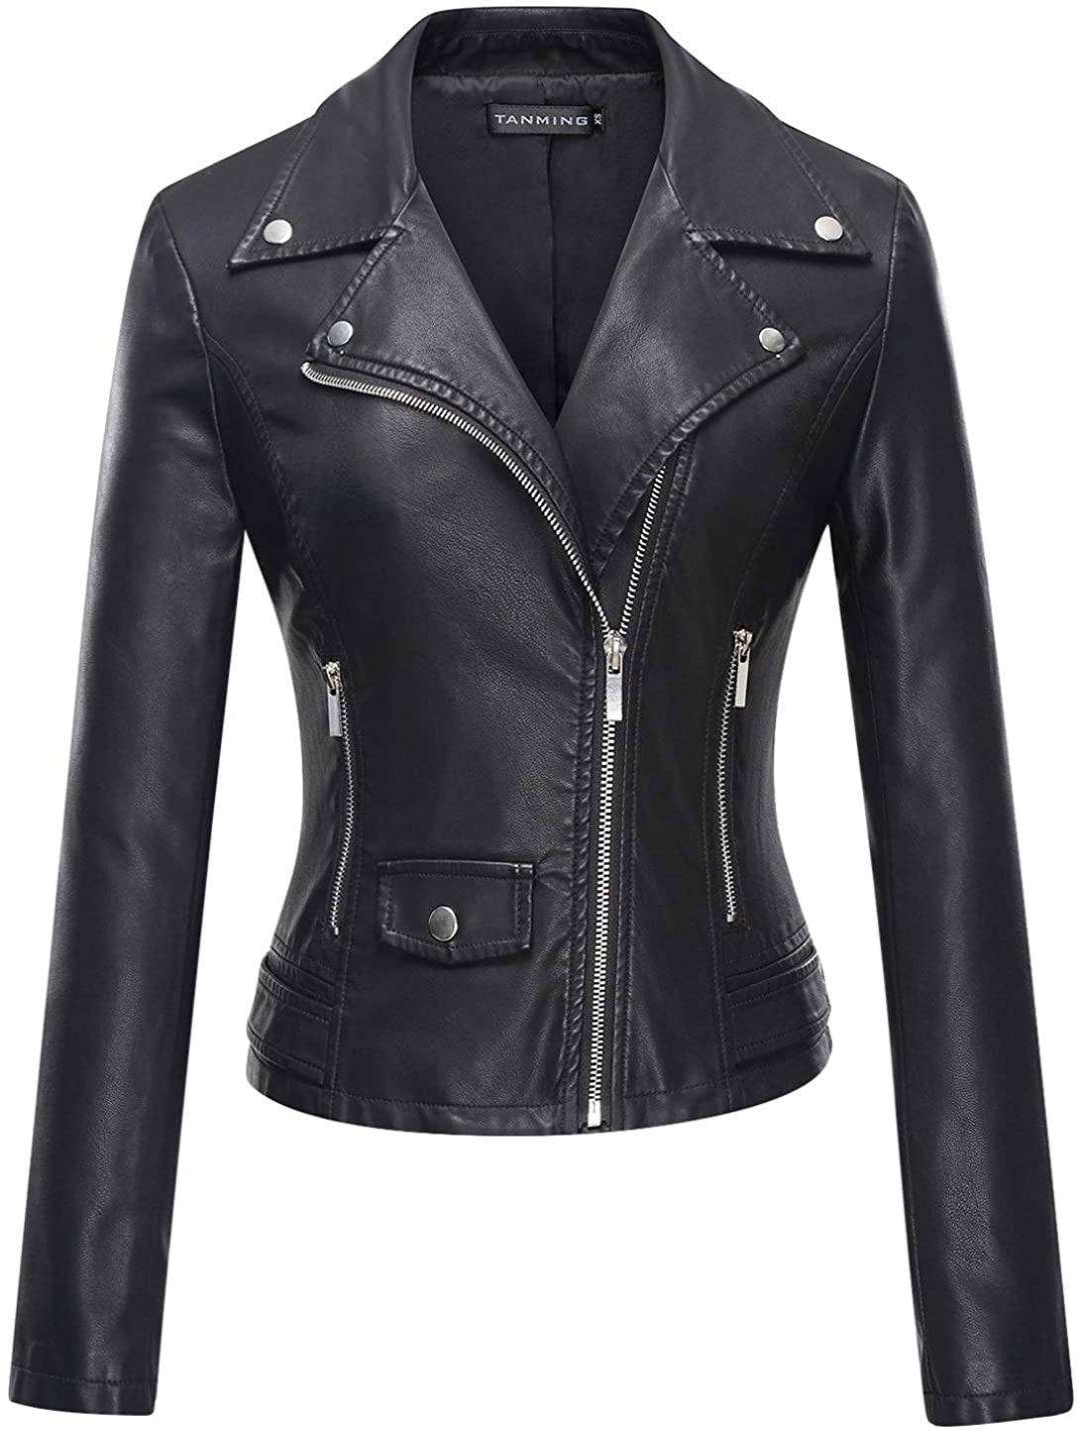 Tanming Women's Faux Leather Moto Biker Short Coat Jacket